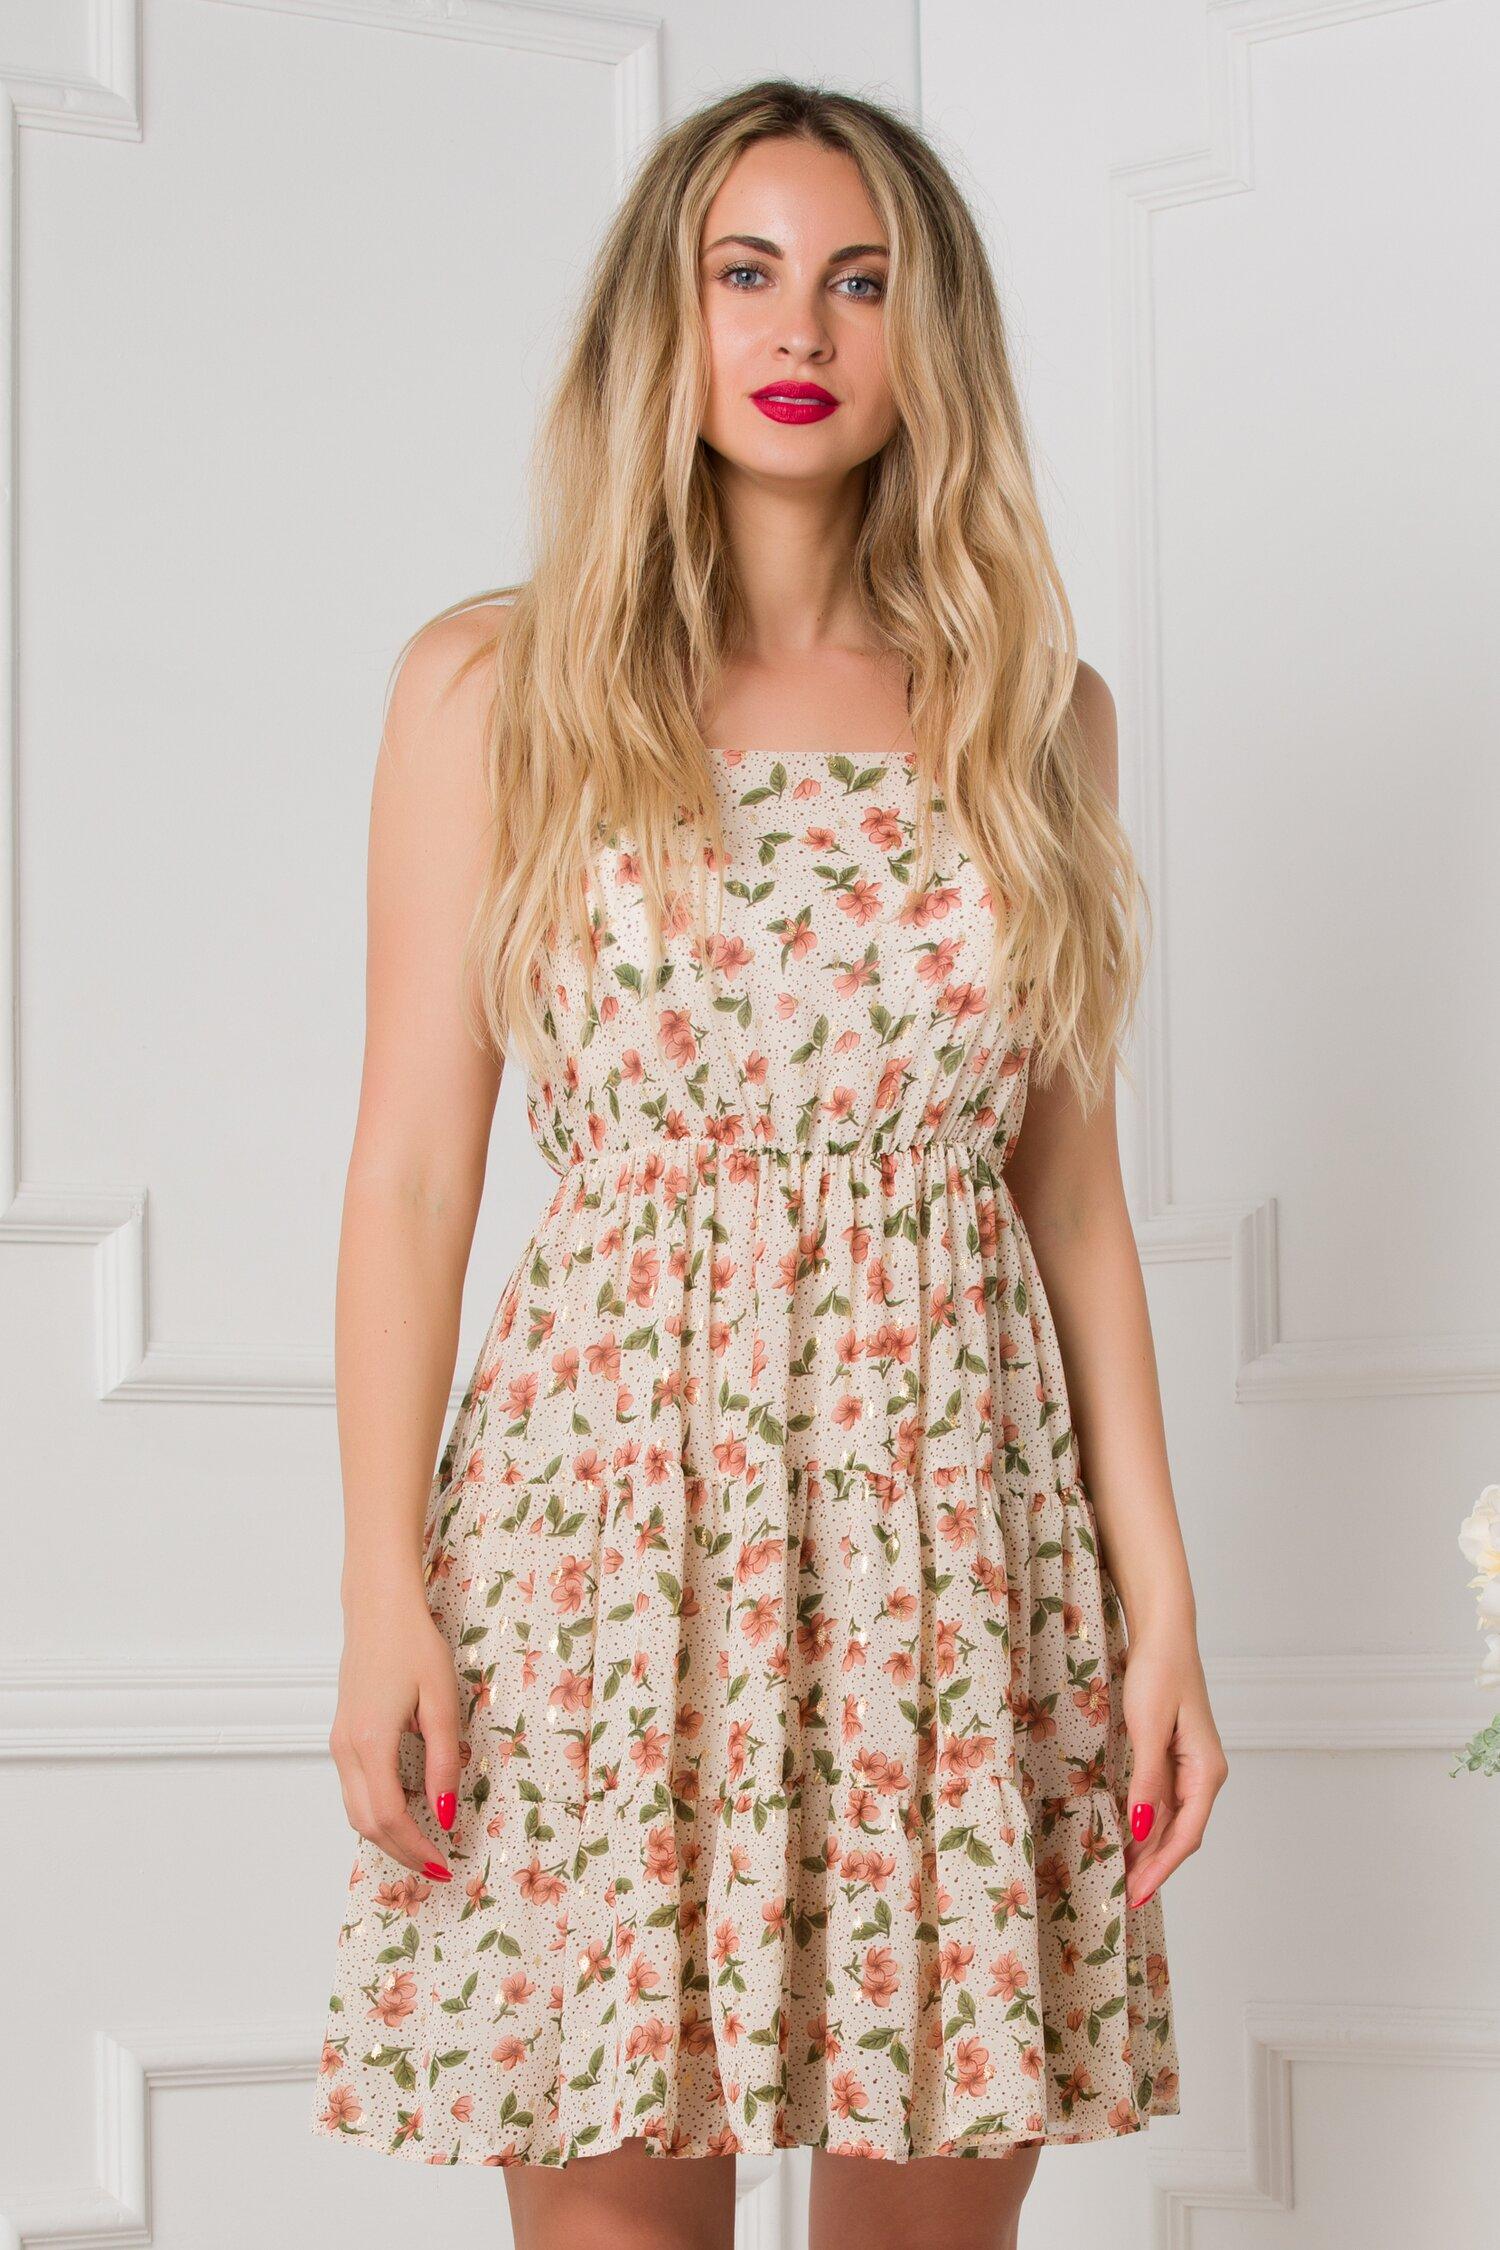 rochie caroline ivory cu imprimeuri florale caramizii 533223 4